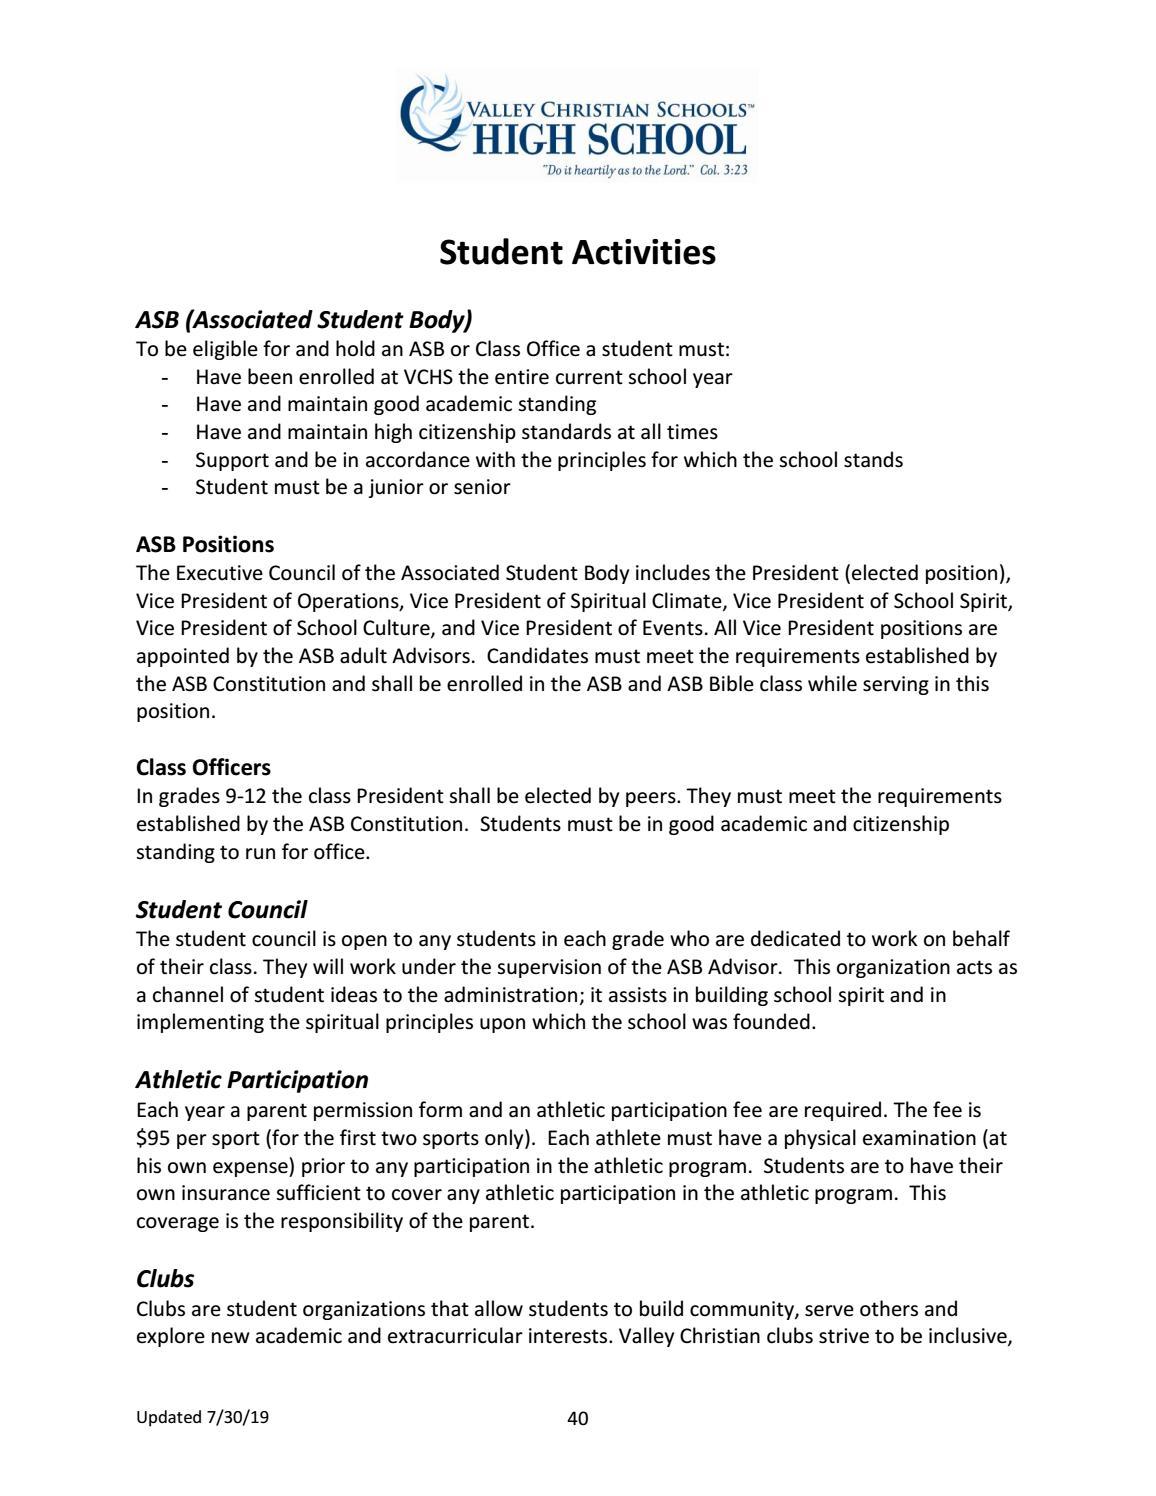 Valley Christian High School Student Handbook by Valley